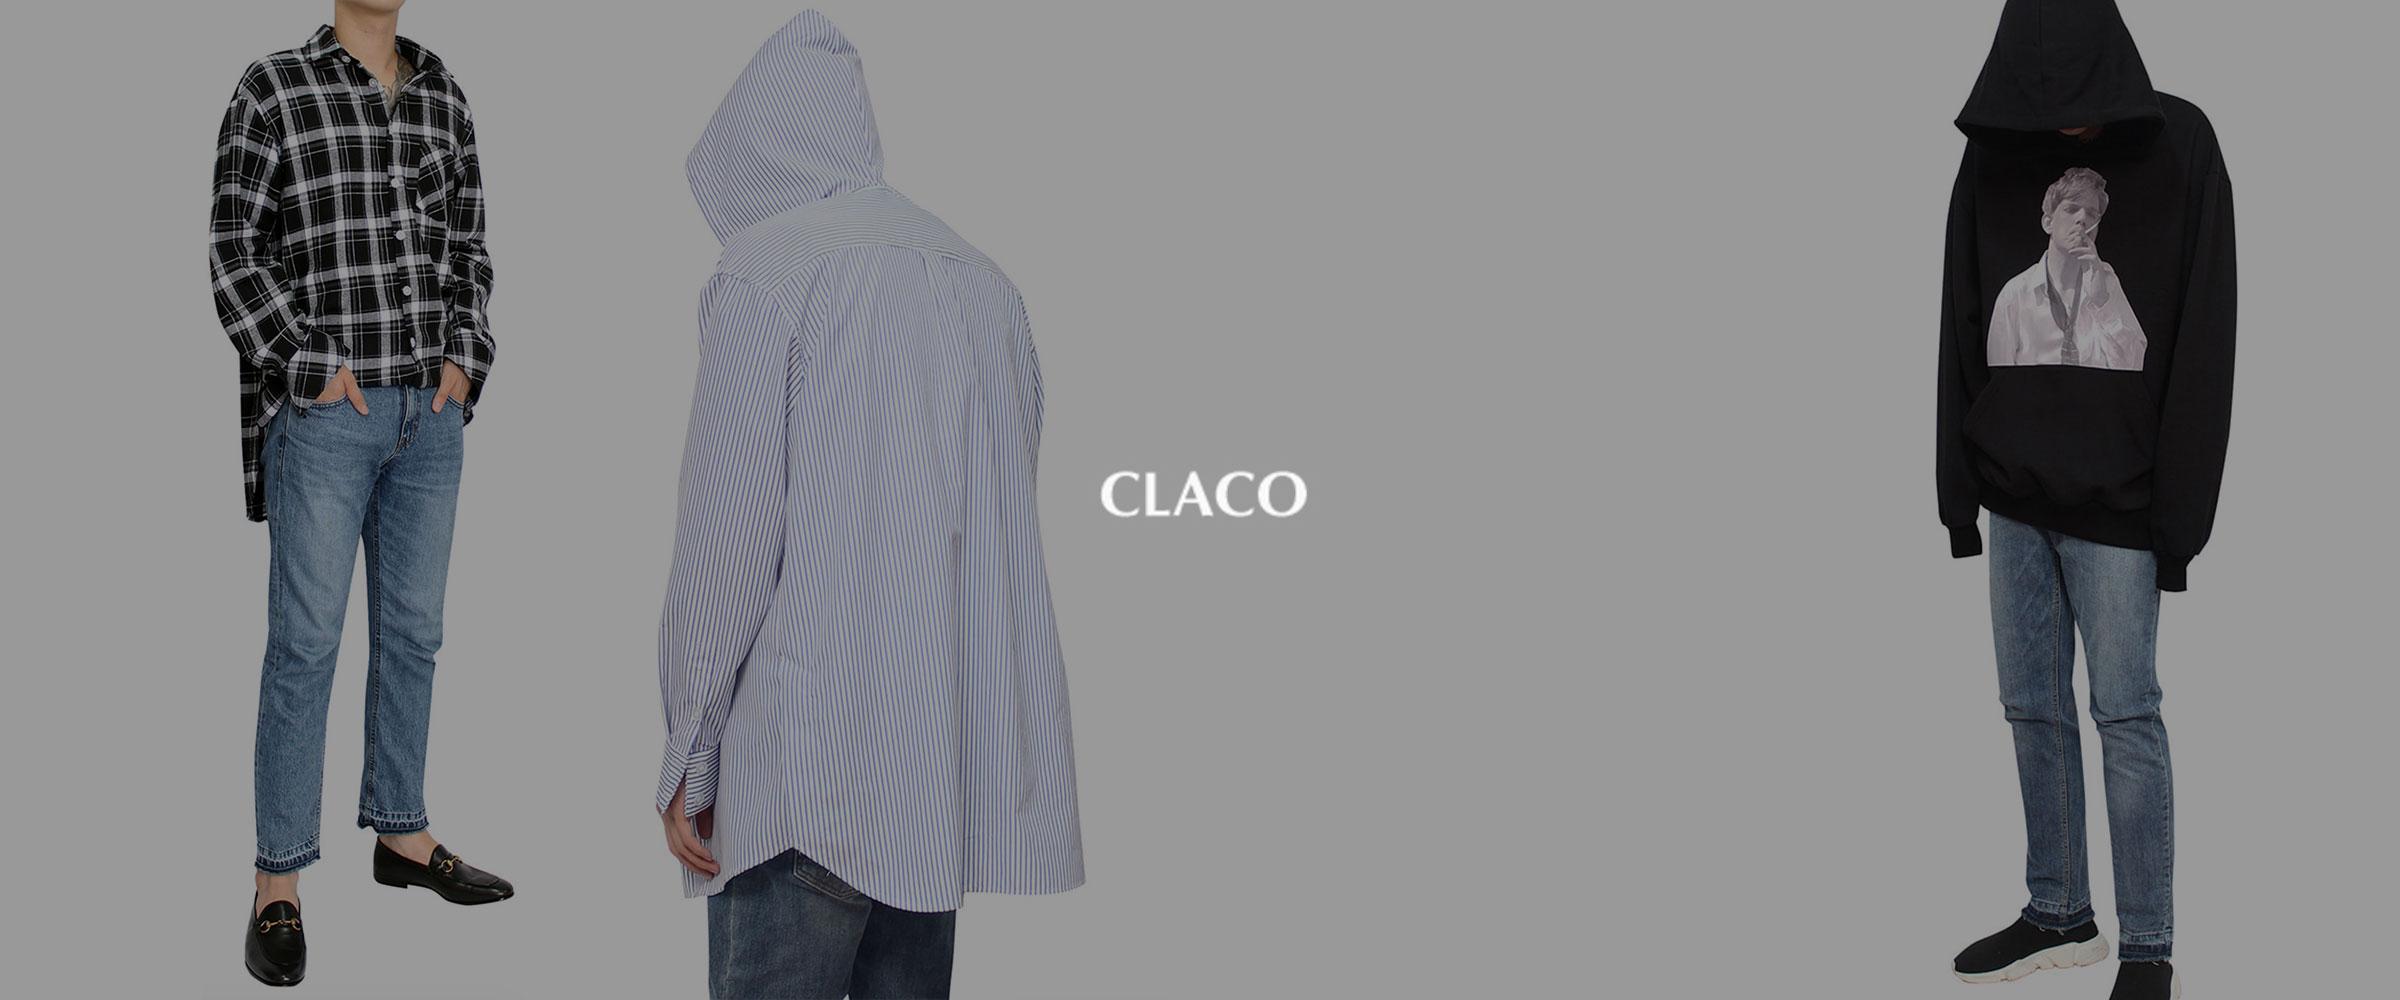 claco.jpg